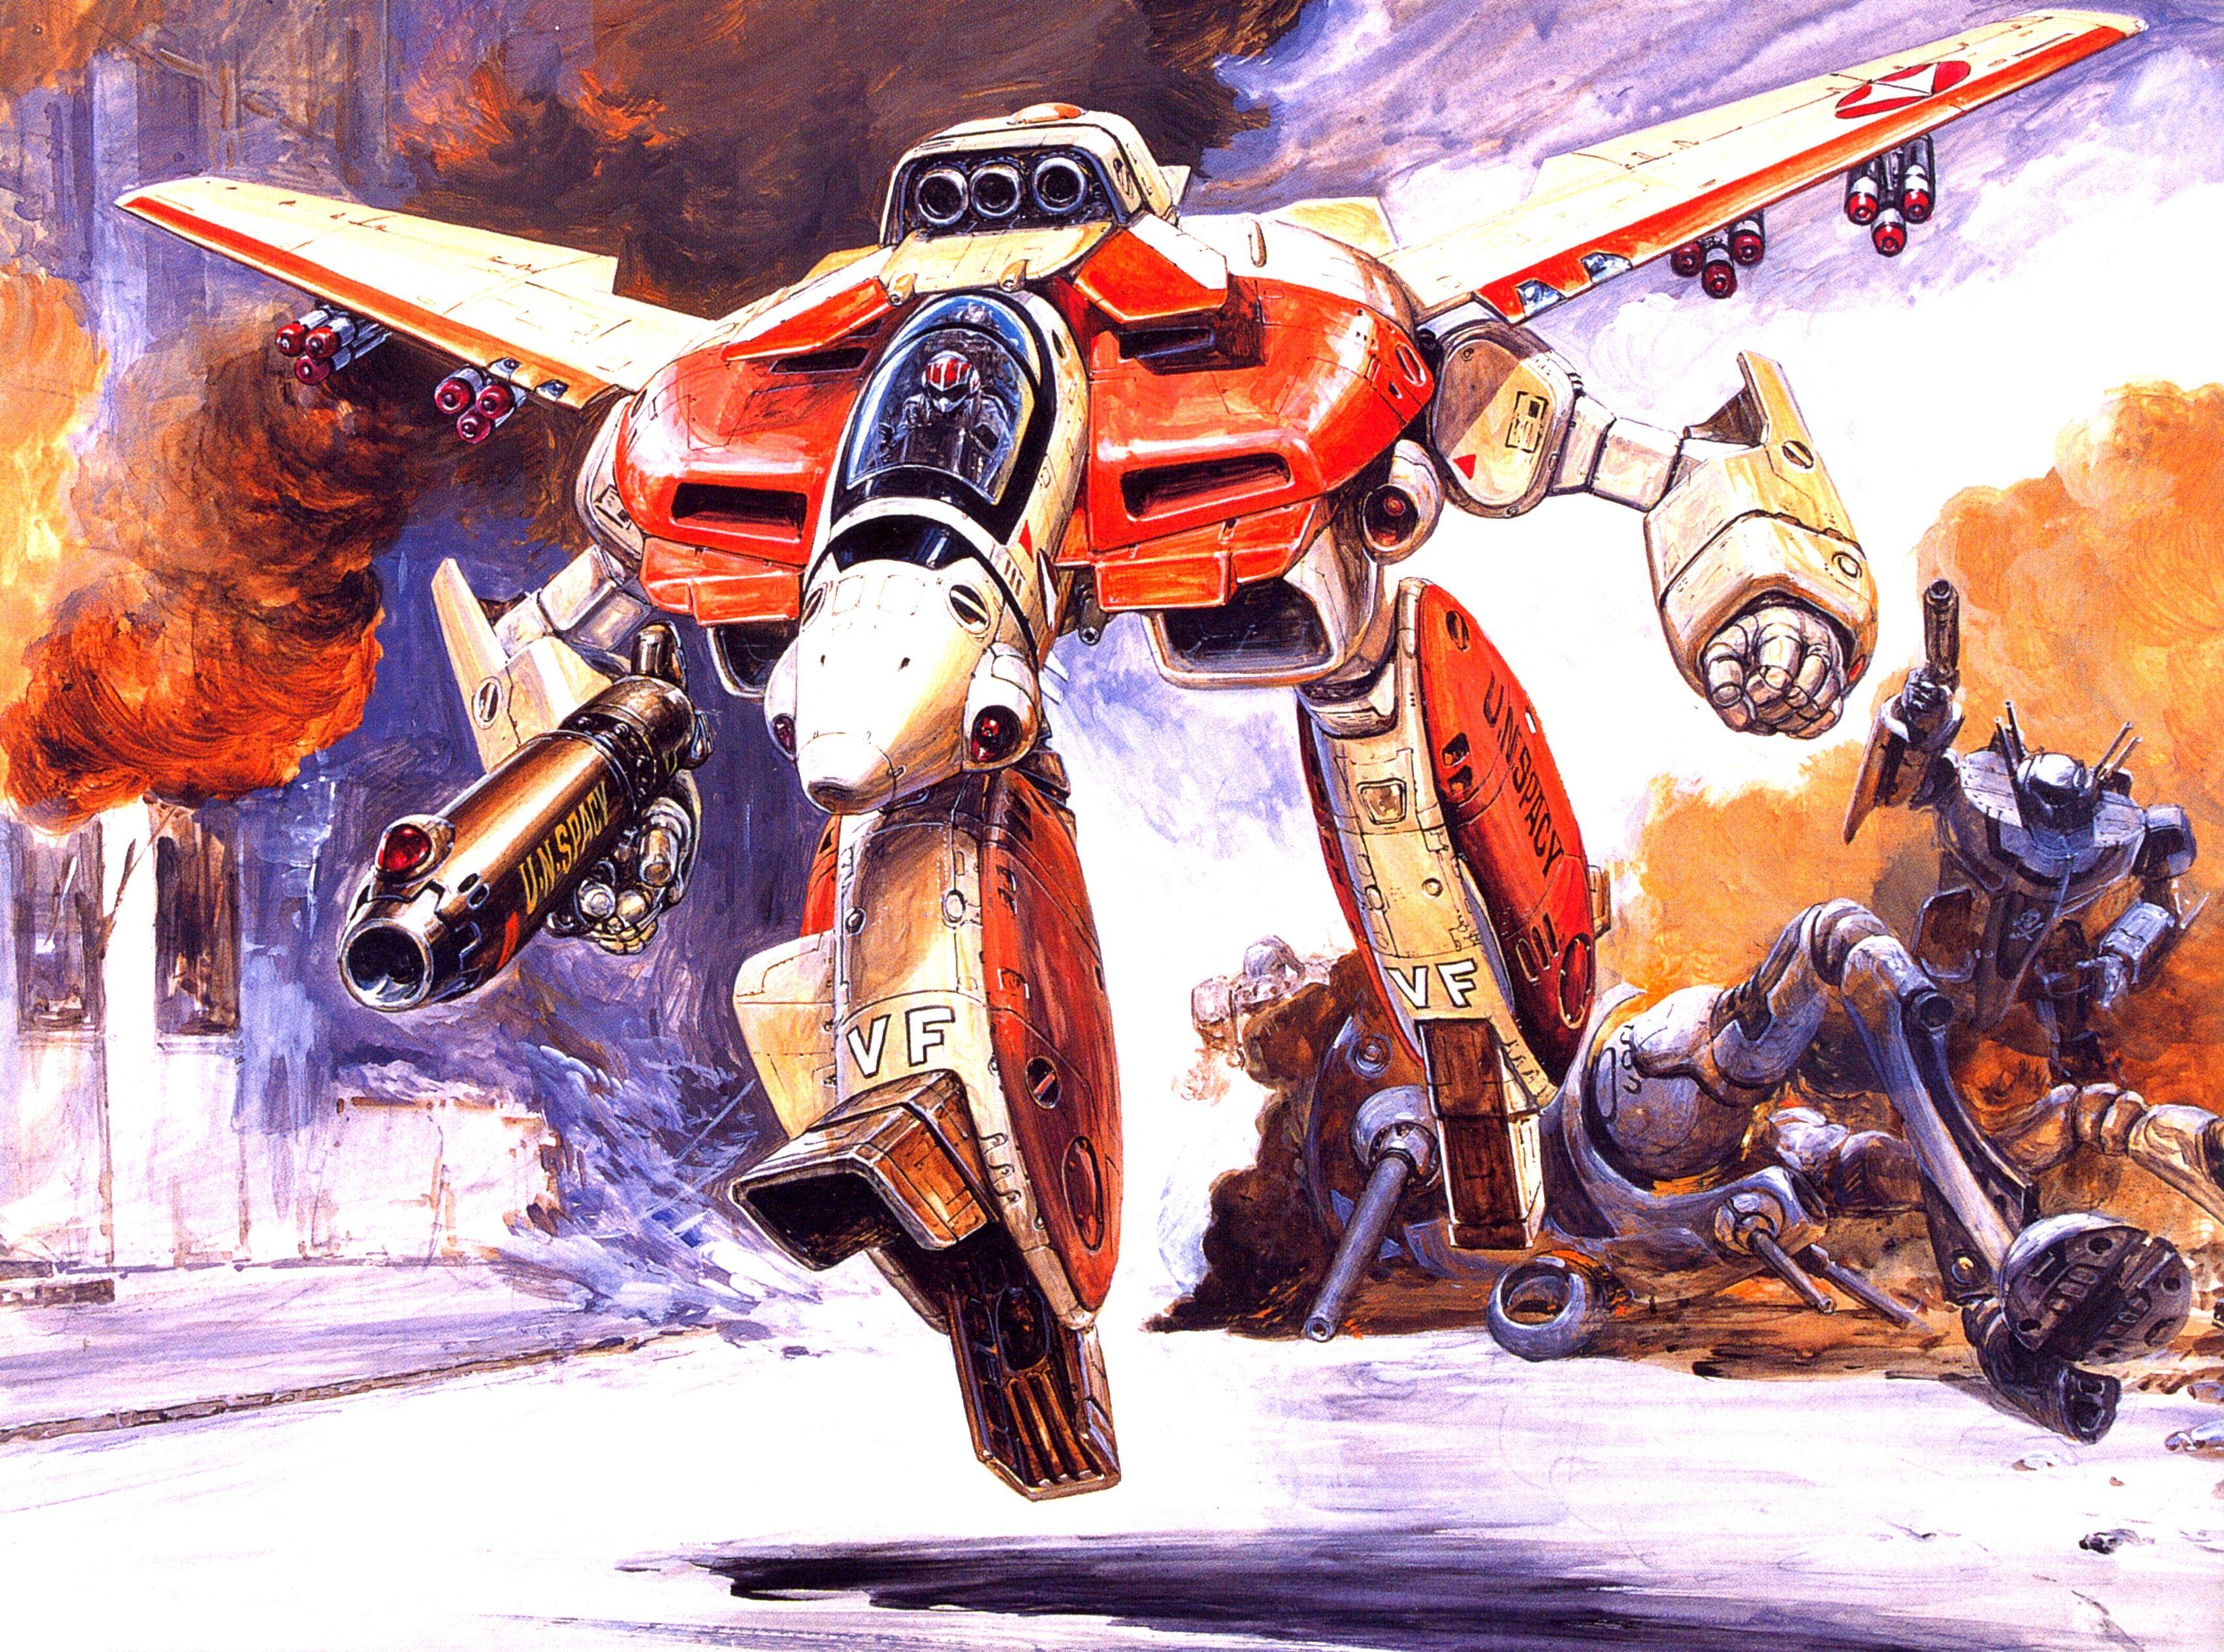 Robotech (Macross)